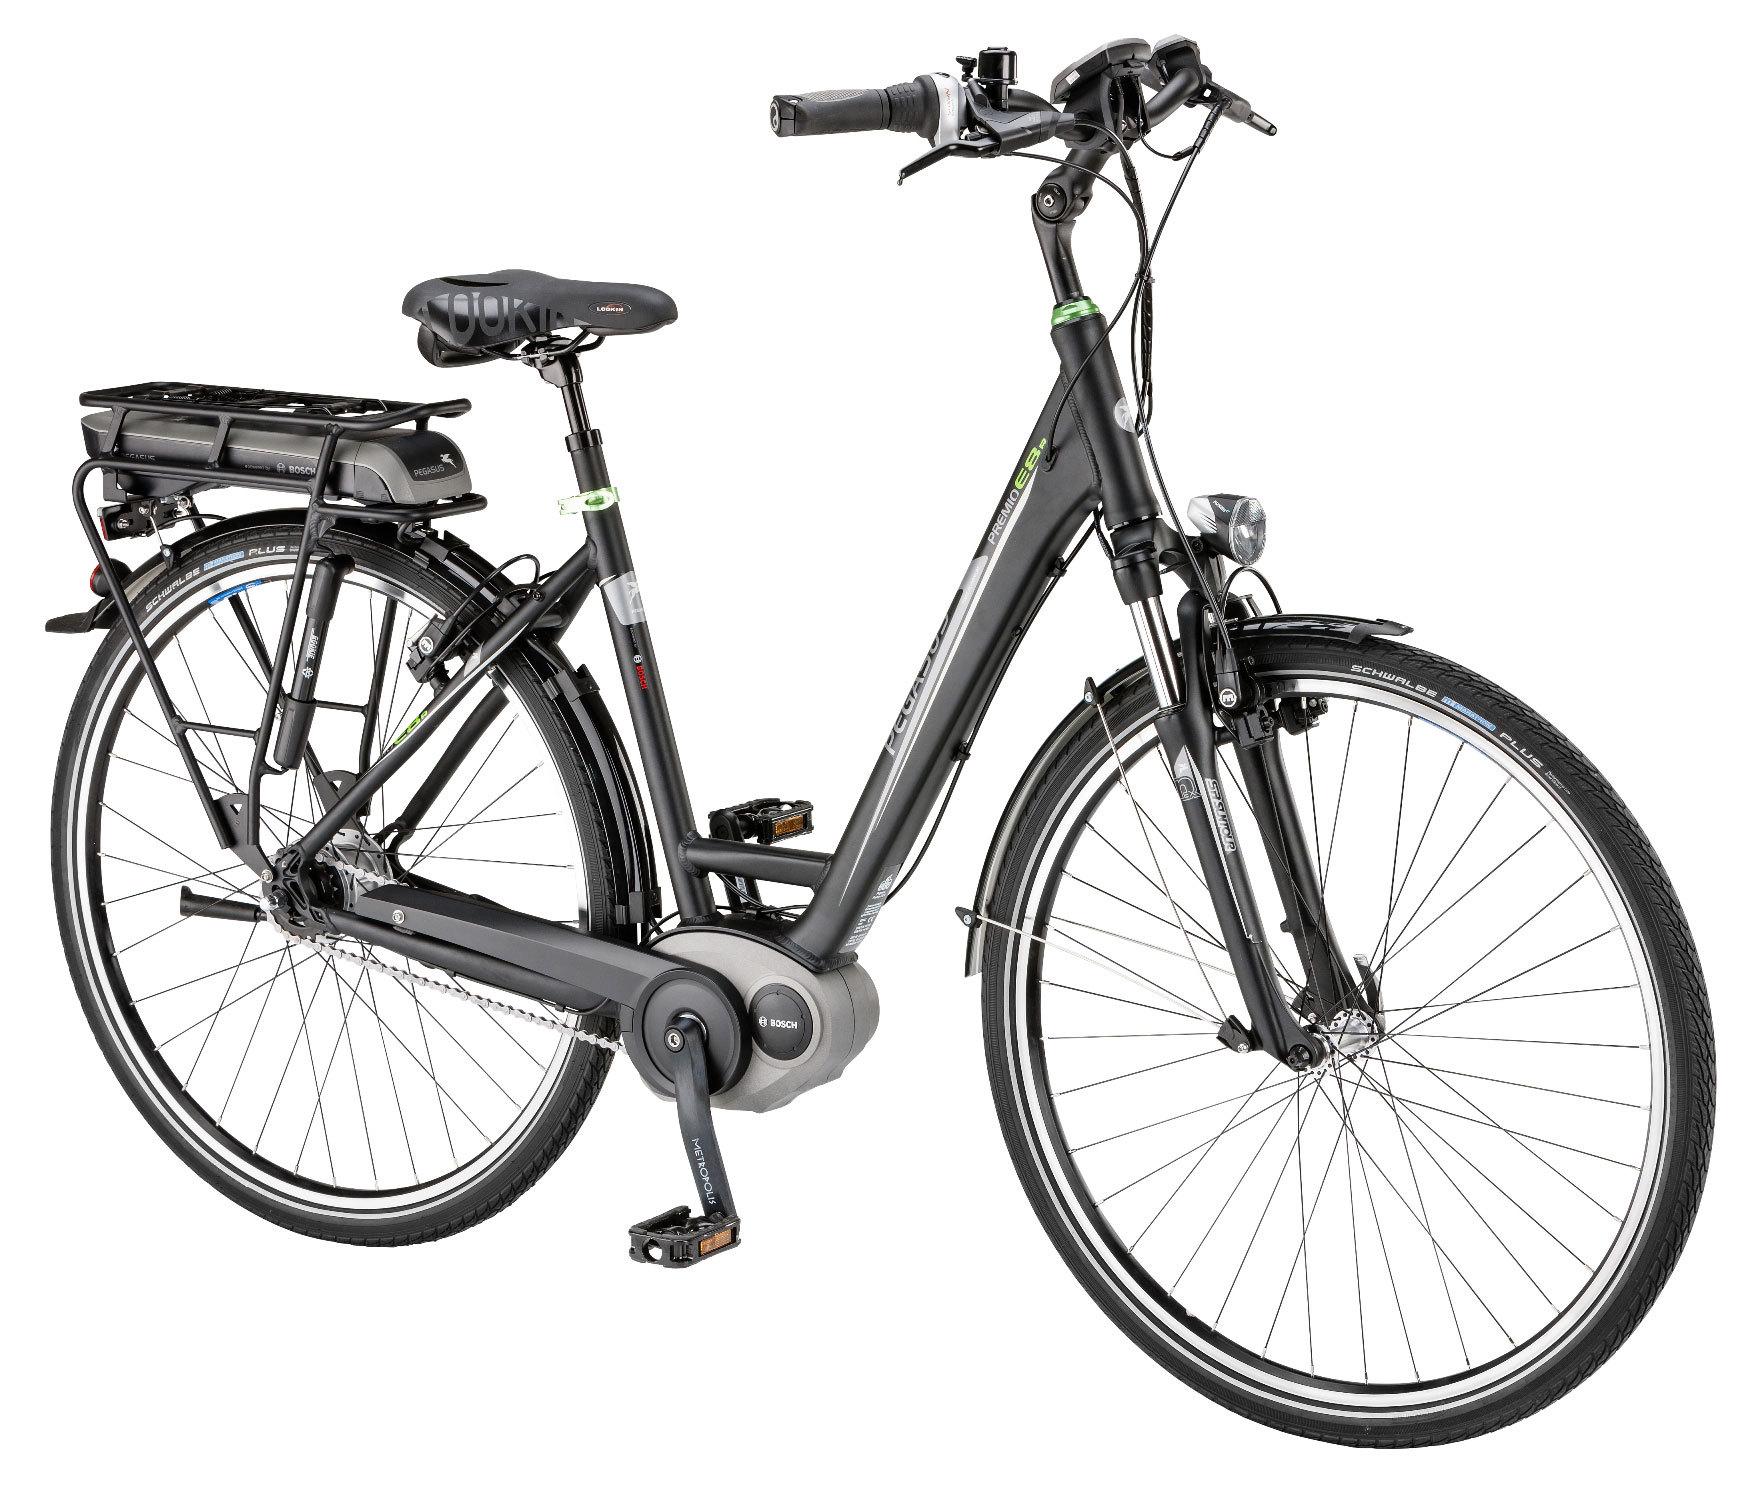 damen elektro fahrrad pegasus premio e8 r e bike bosch 11. Black Bedroom Furniture Sets. Home Design Ideas